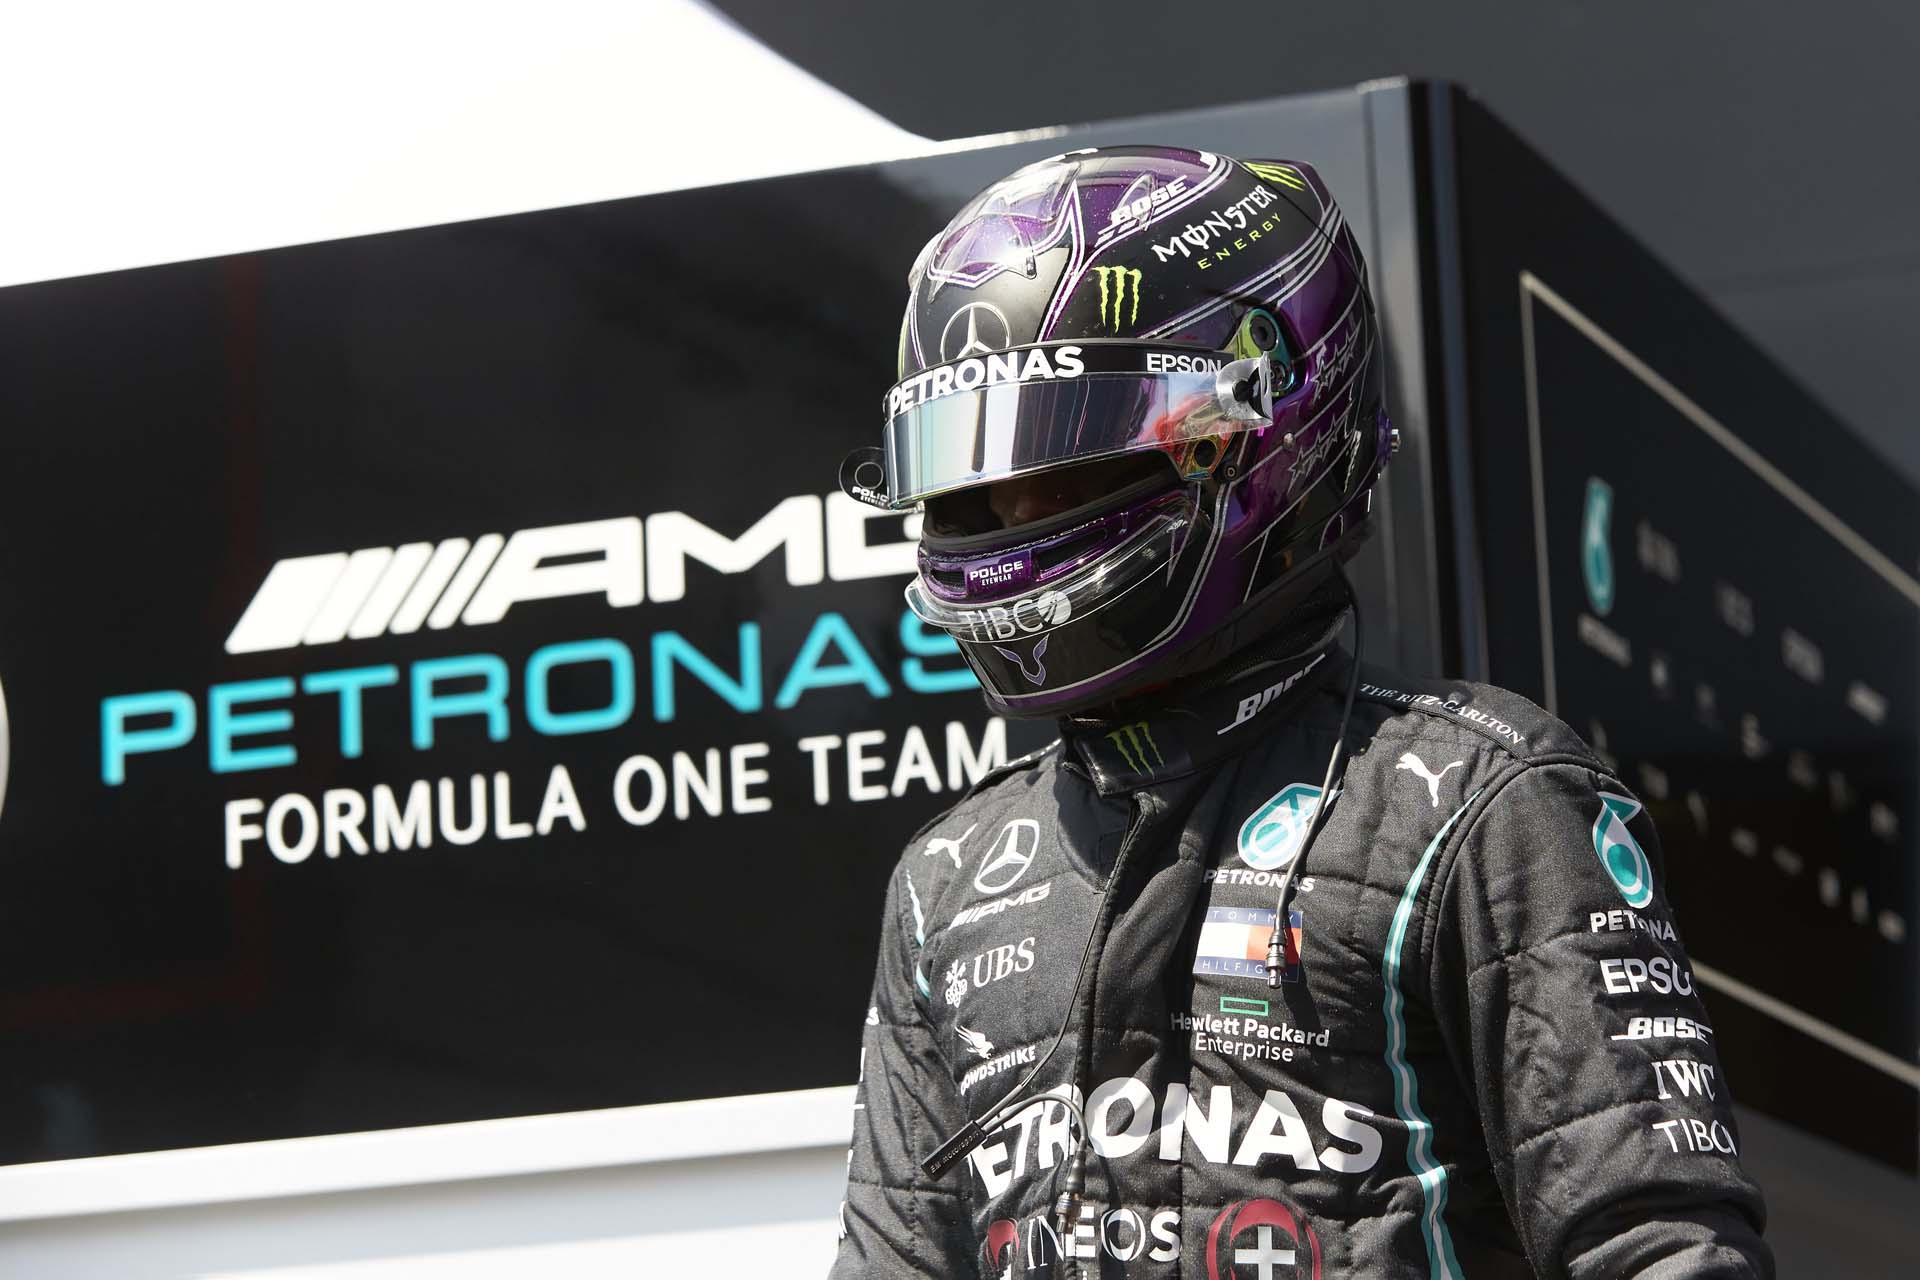 2020 70th Anniversary Grand Prix, Saturday - Steve Etherington